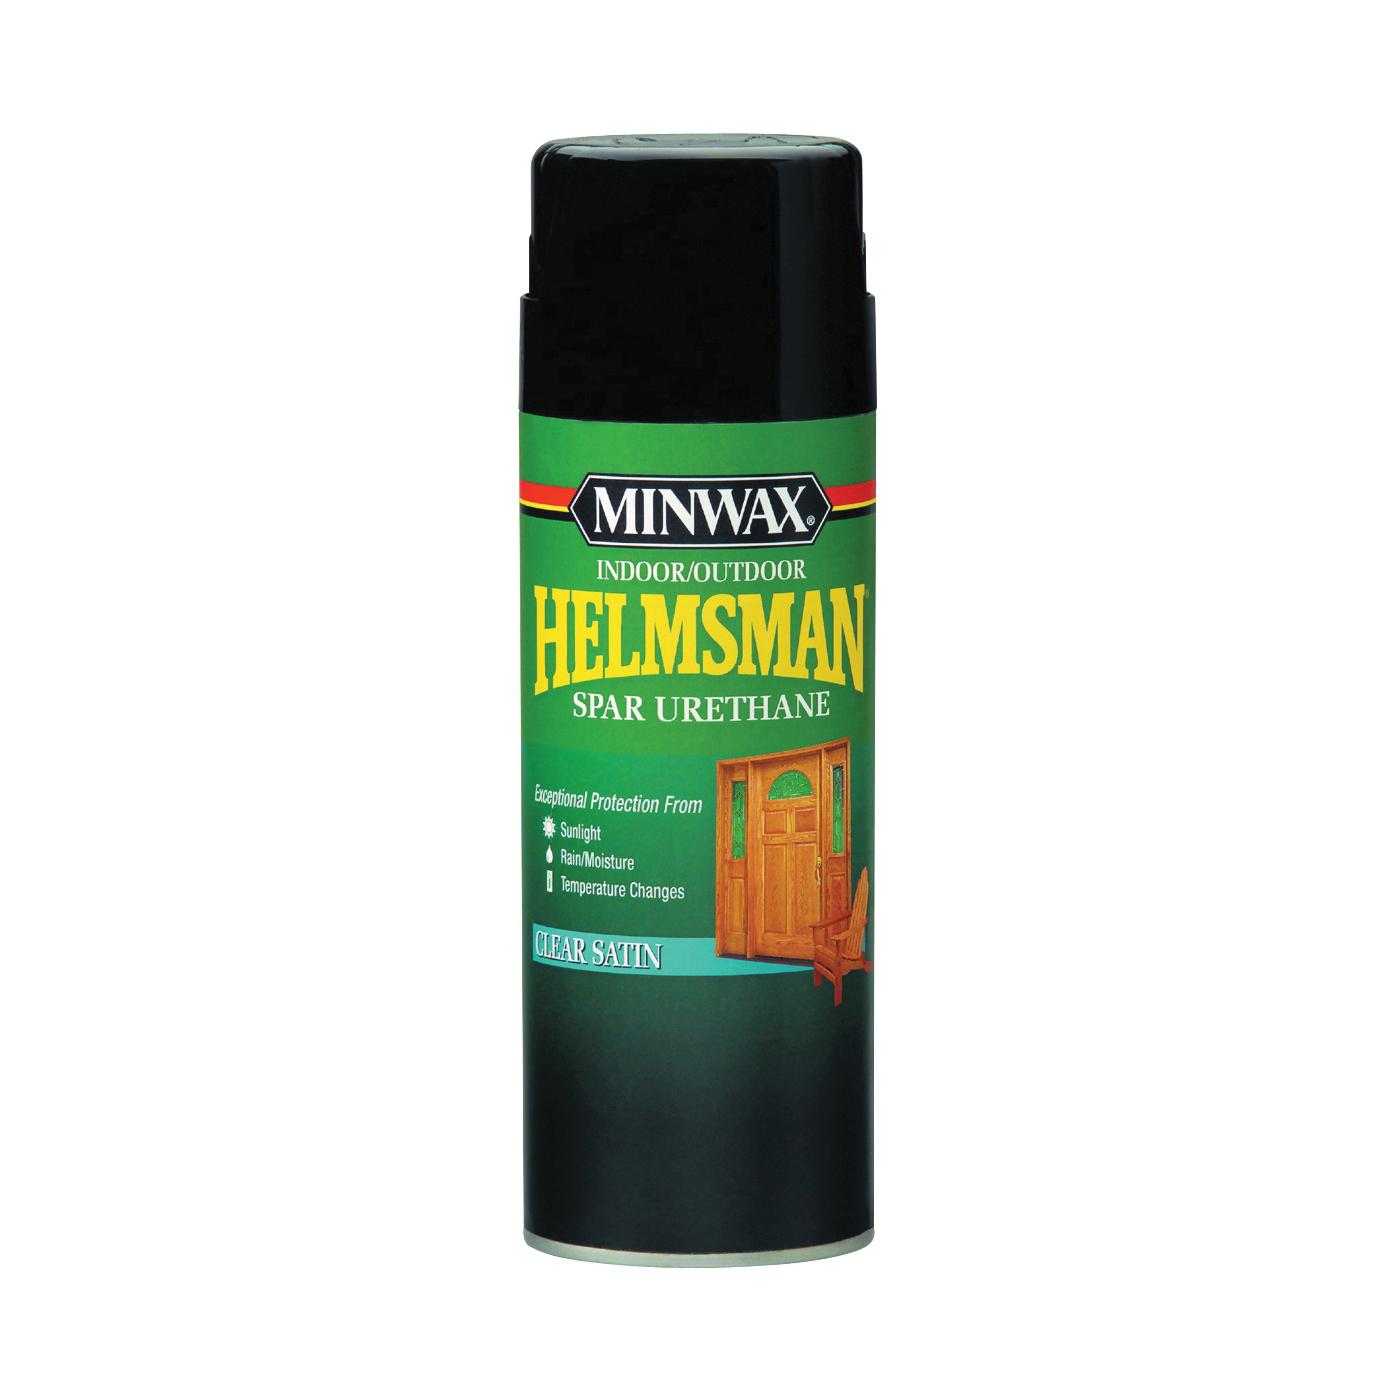 Picture of Minwax Helmsman 33255000 Spar Urethane Paint, Clear Satin, Clear, Liquid, 11.5 oz, Aerosol Can